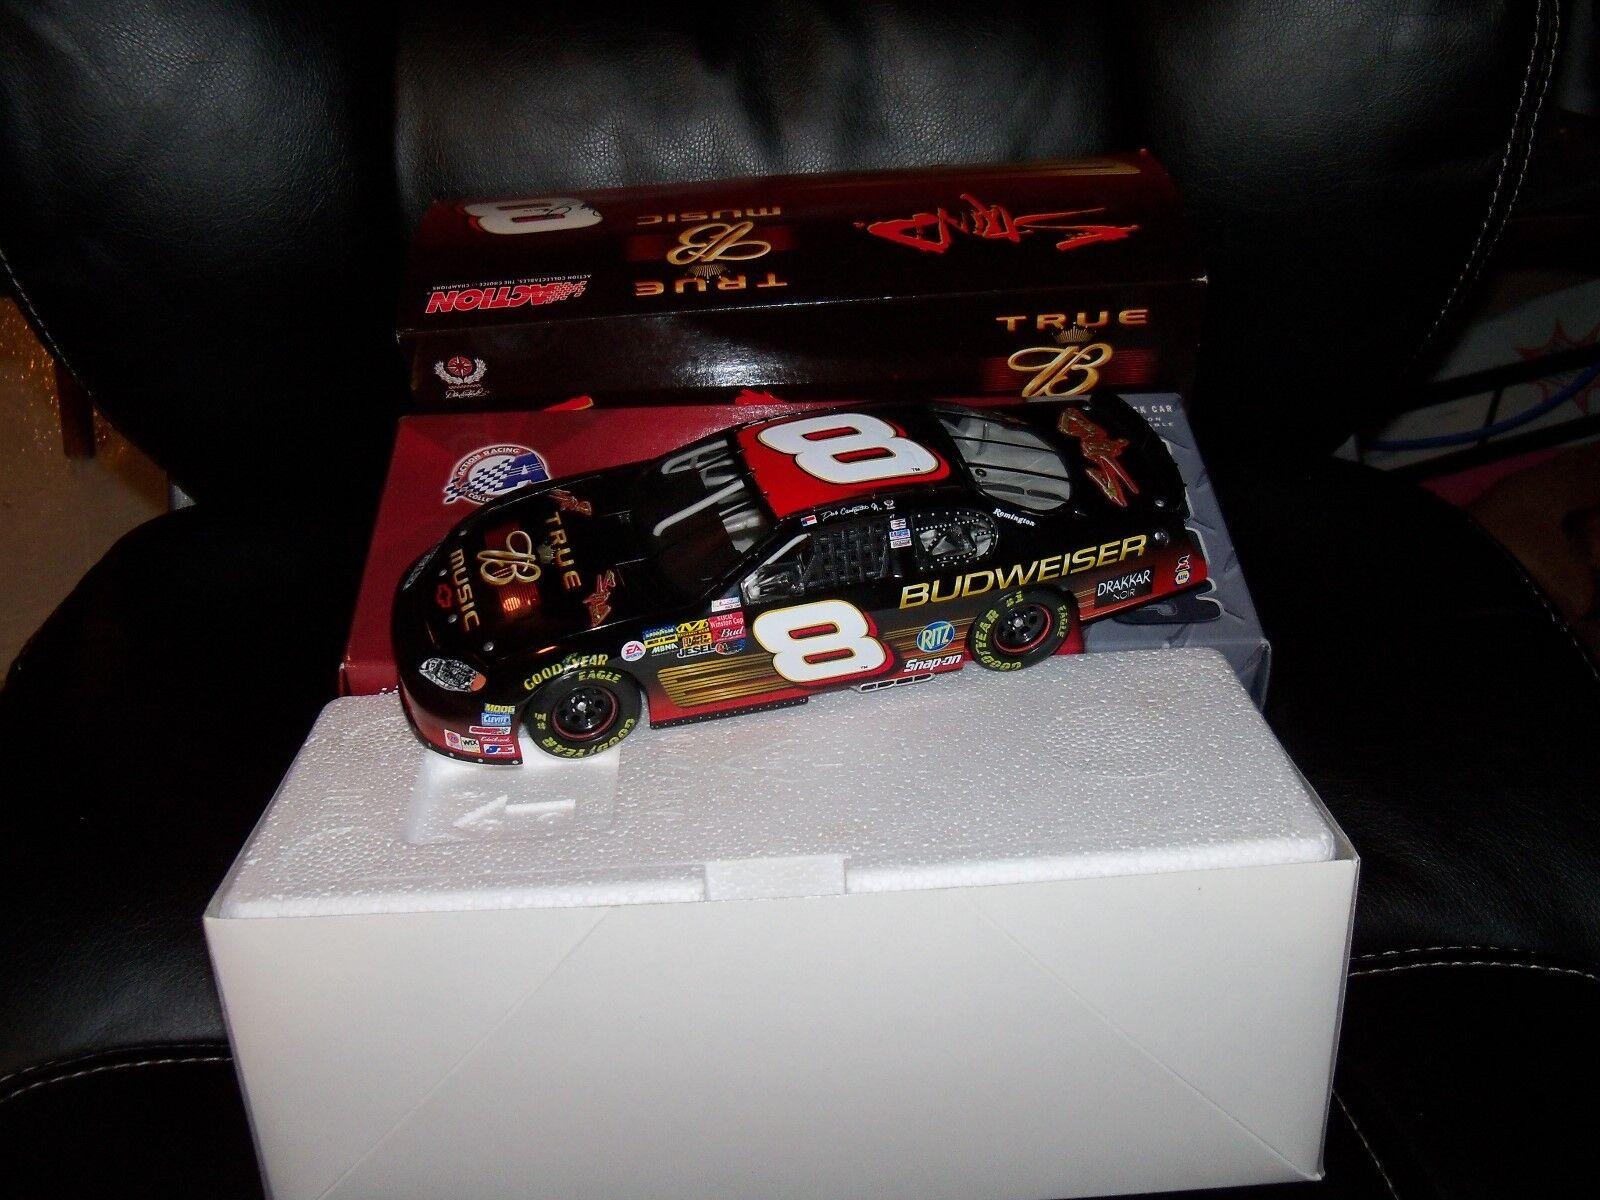 Dale Earnhardt Jr. 2003 Budweiser True Music Music Music Staind Car Mint 5e991b